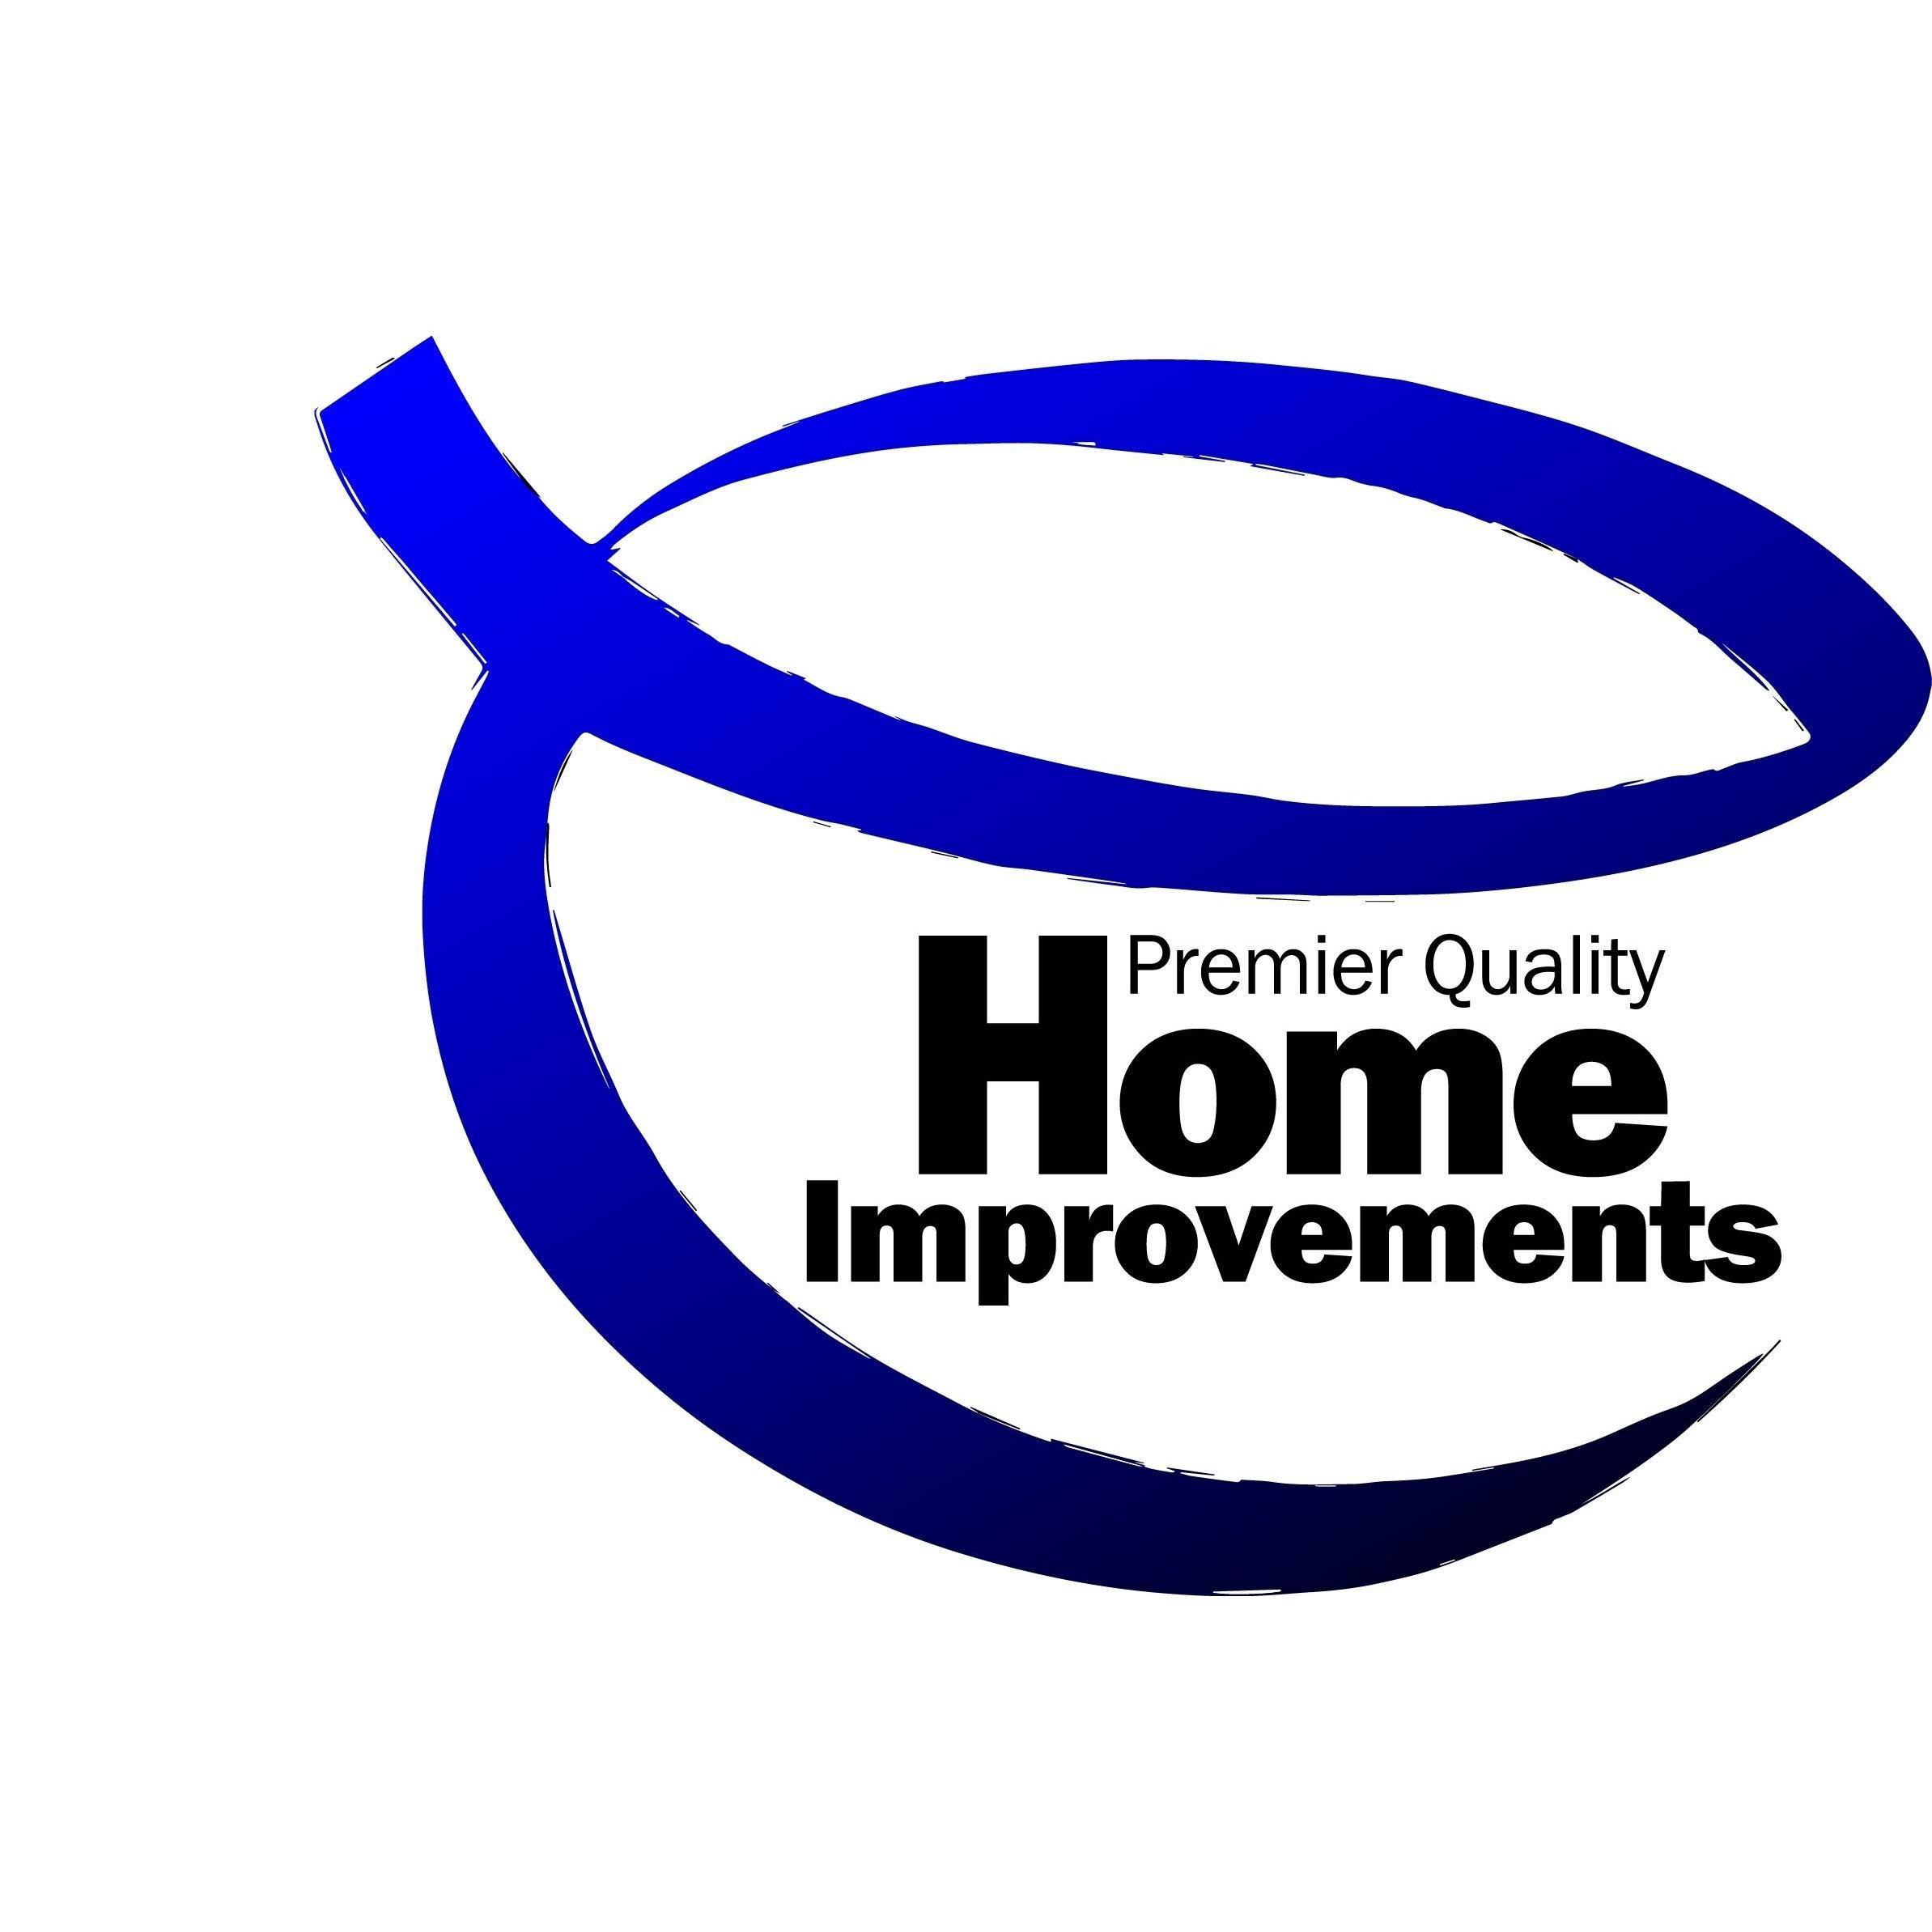 Premier Quality Home Improvements LLC